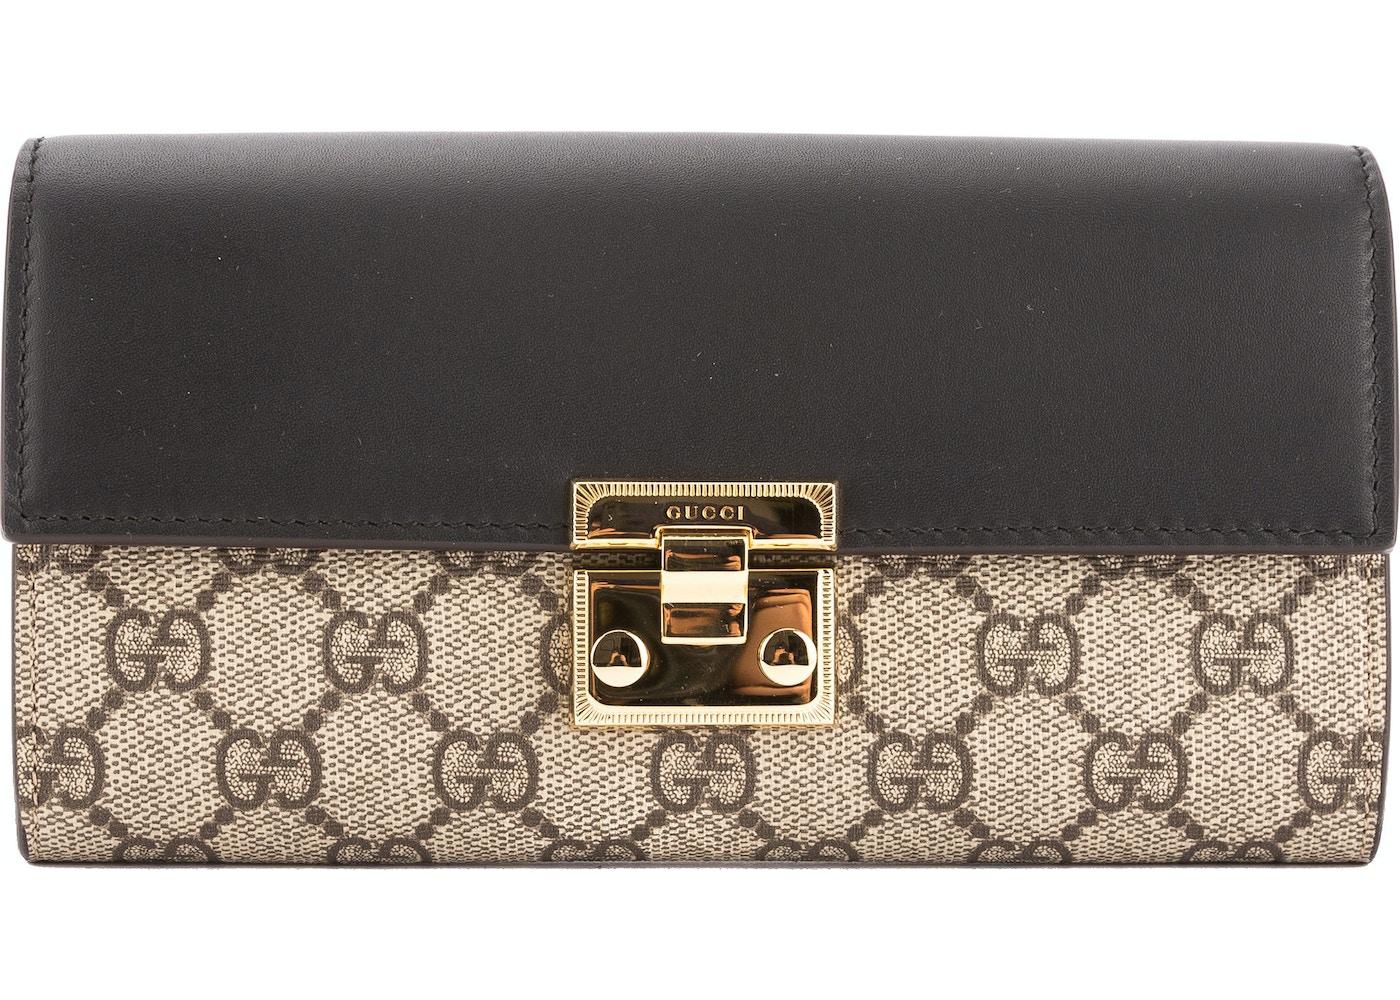 bda7ff4635a Sell. or Ask. View All Bids. Gucci Continental Padlock Wallet Monogram GG  Supreme